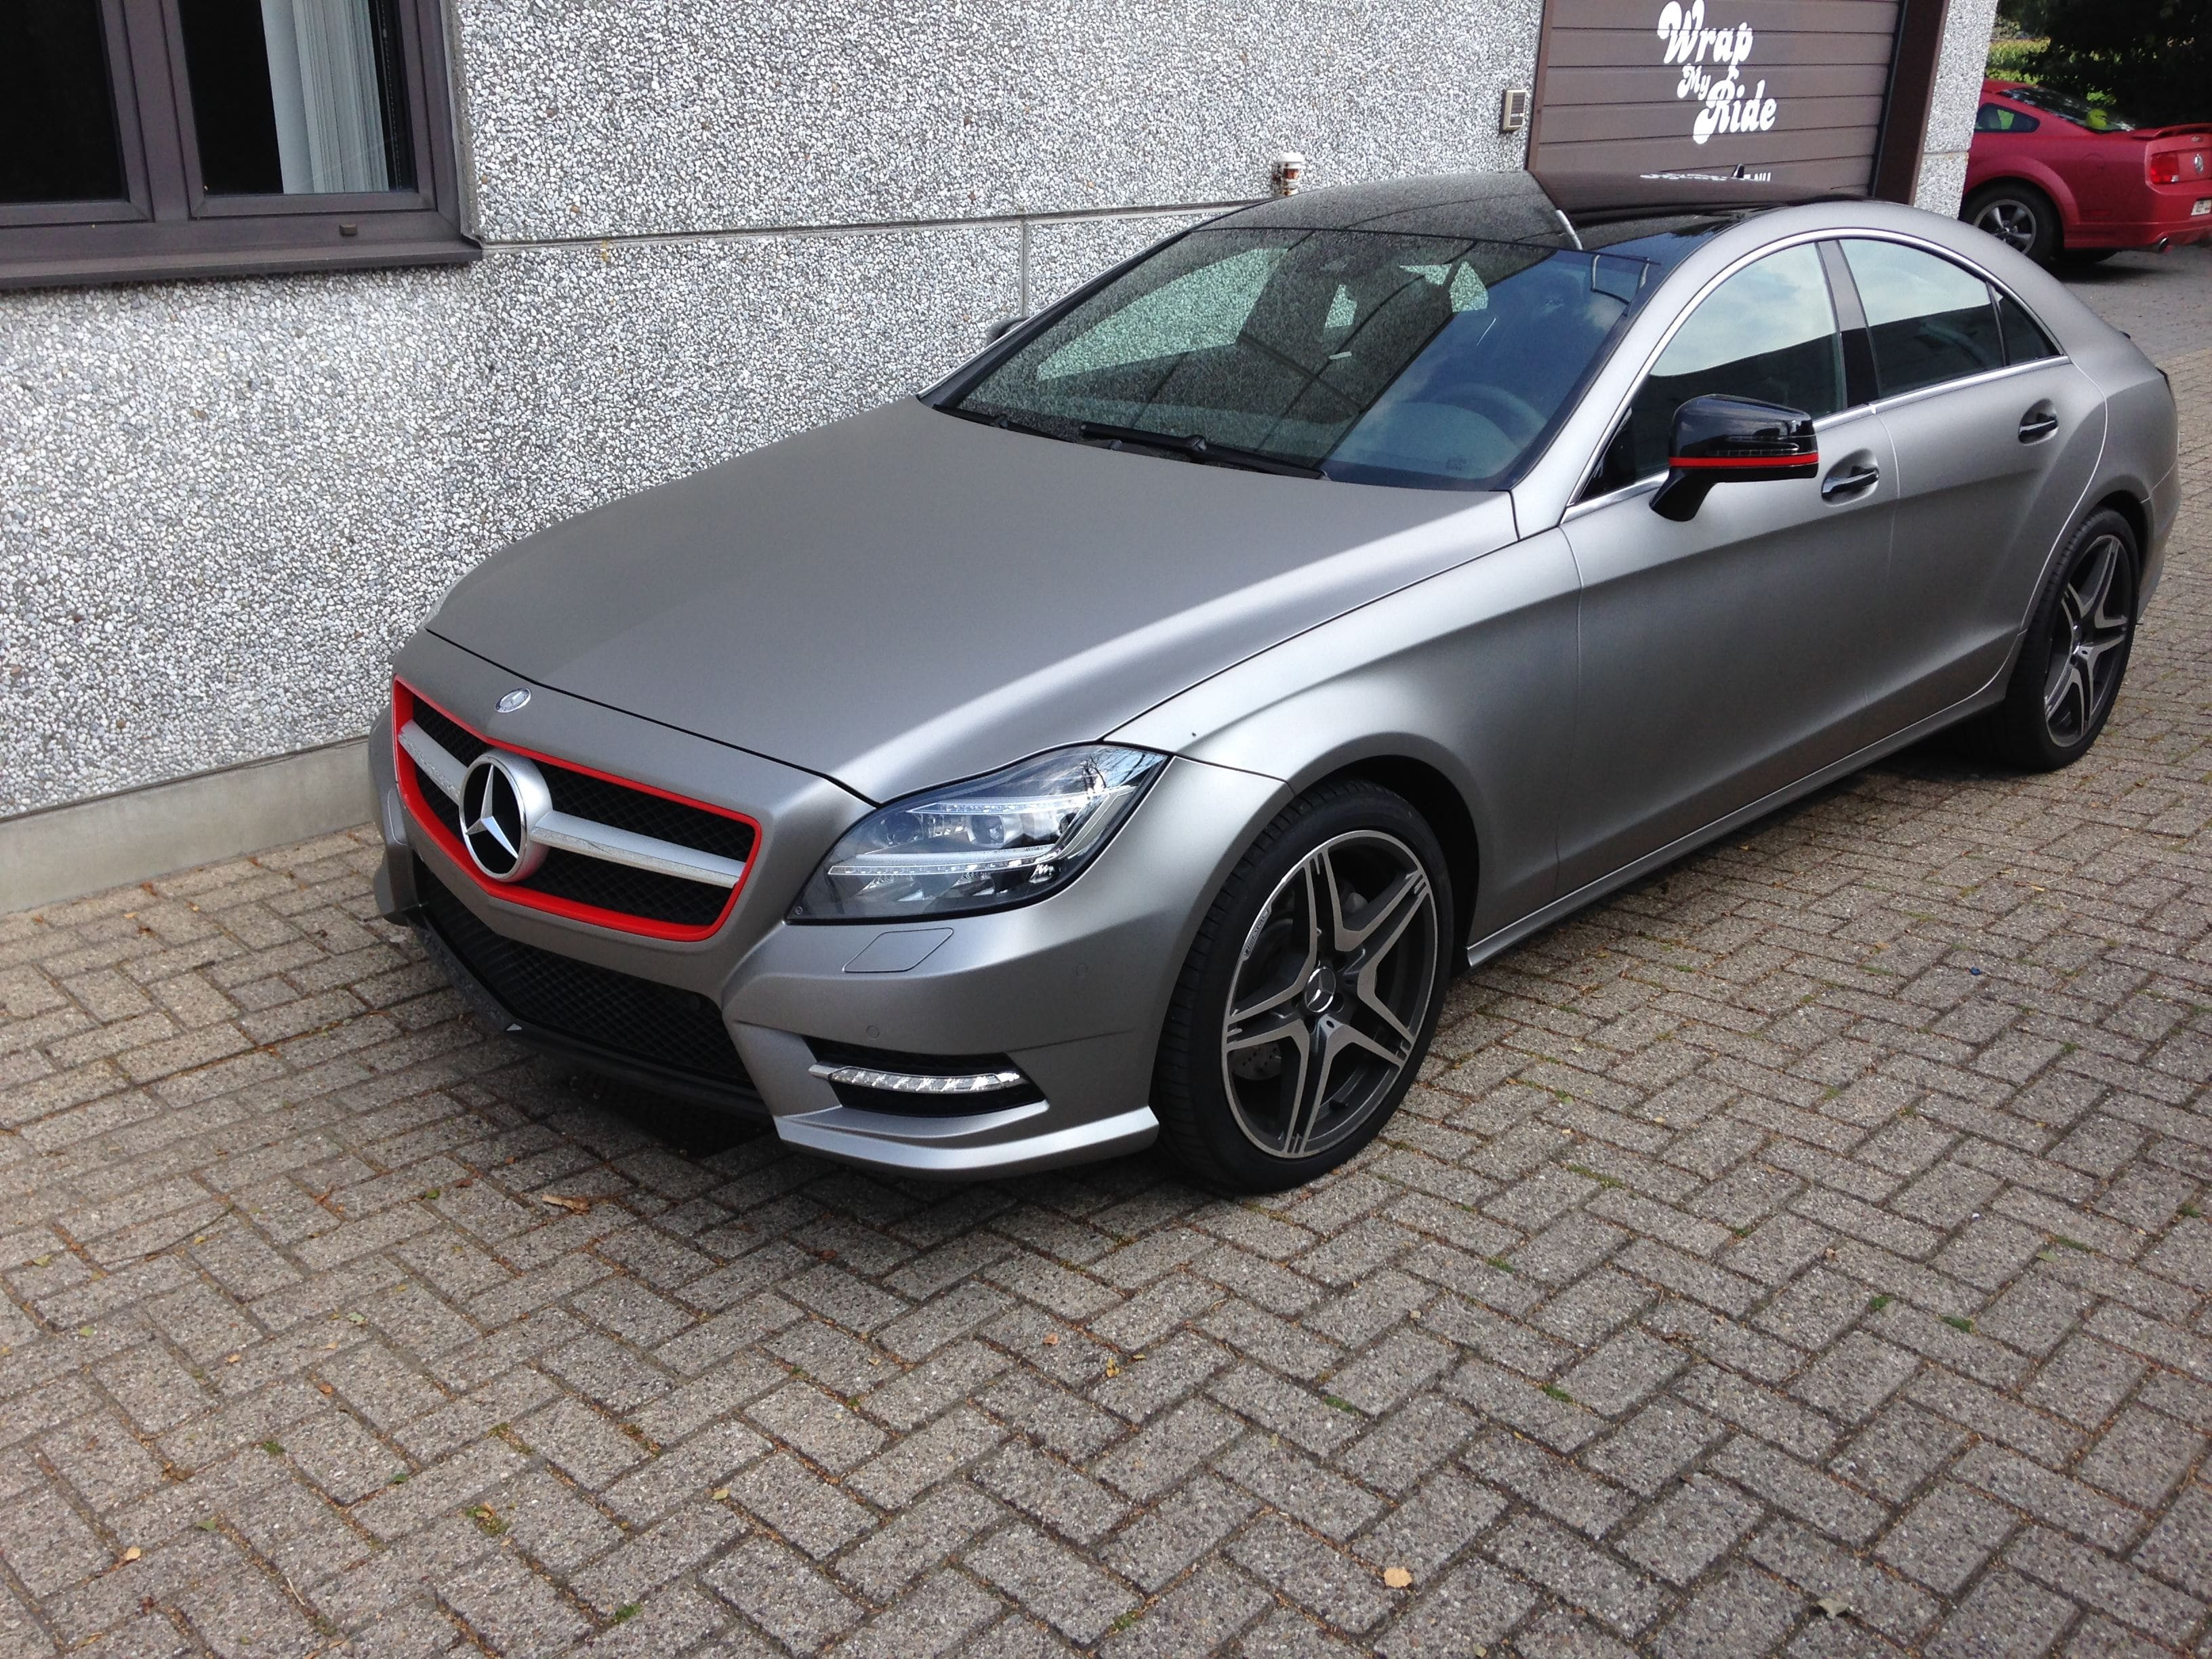 Mercedes CLS met Mat Grey Aluminium Wrap, Carwrapping door Wrapmyride.nu Foto-nr:6138, ©2020